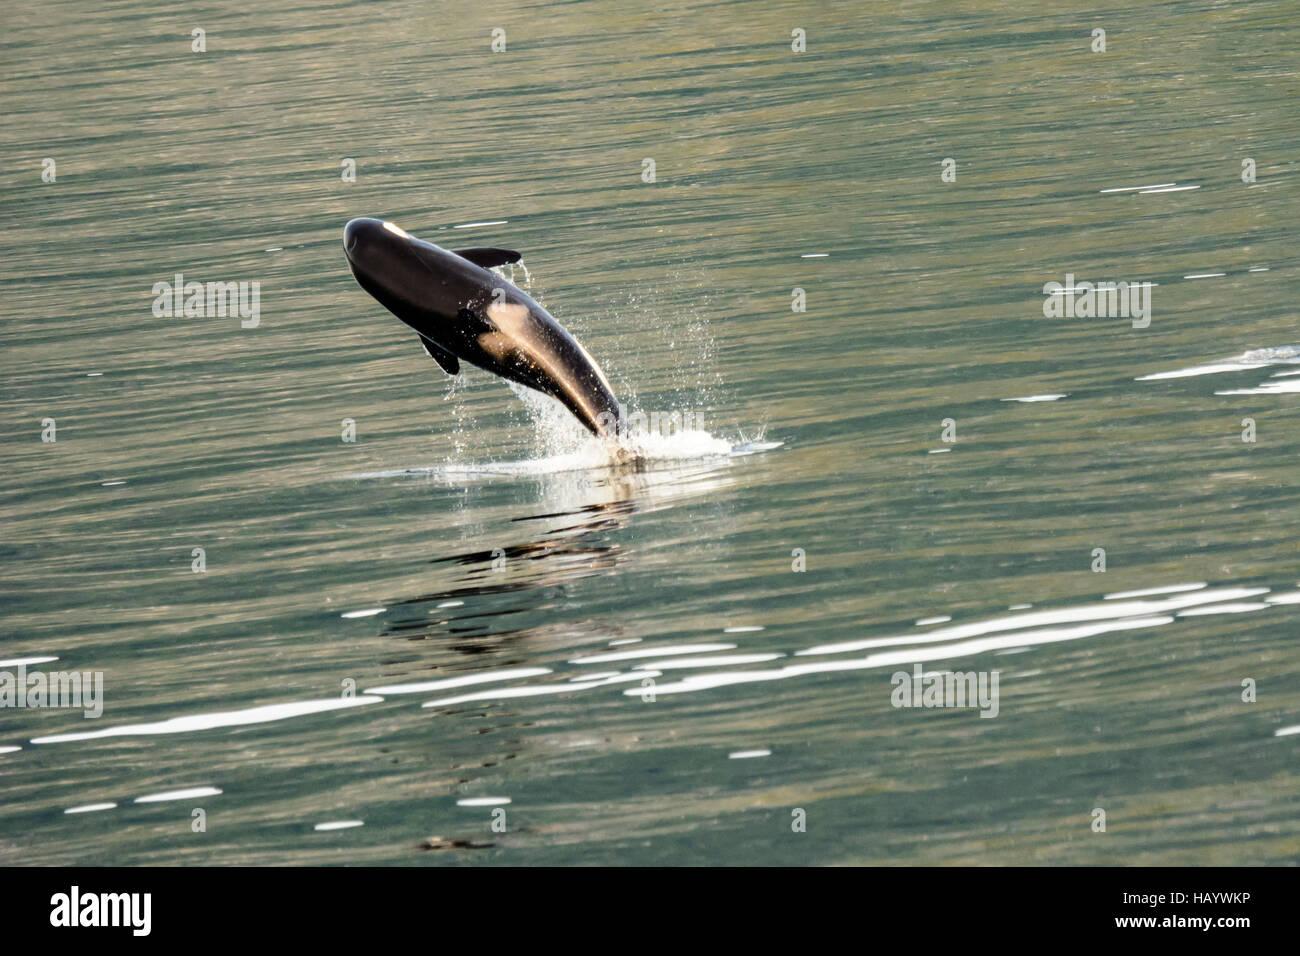 killer whale leaping for joy - Stock Image